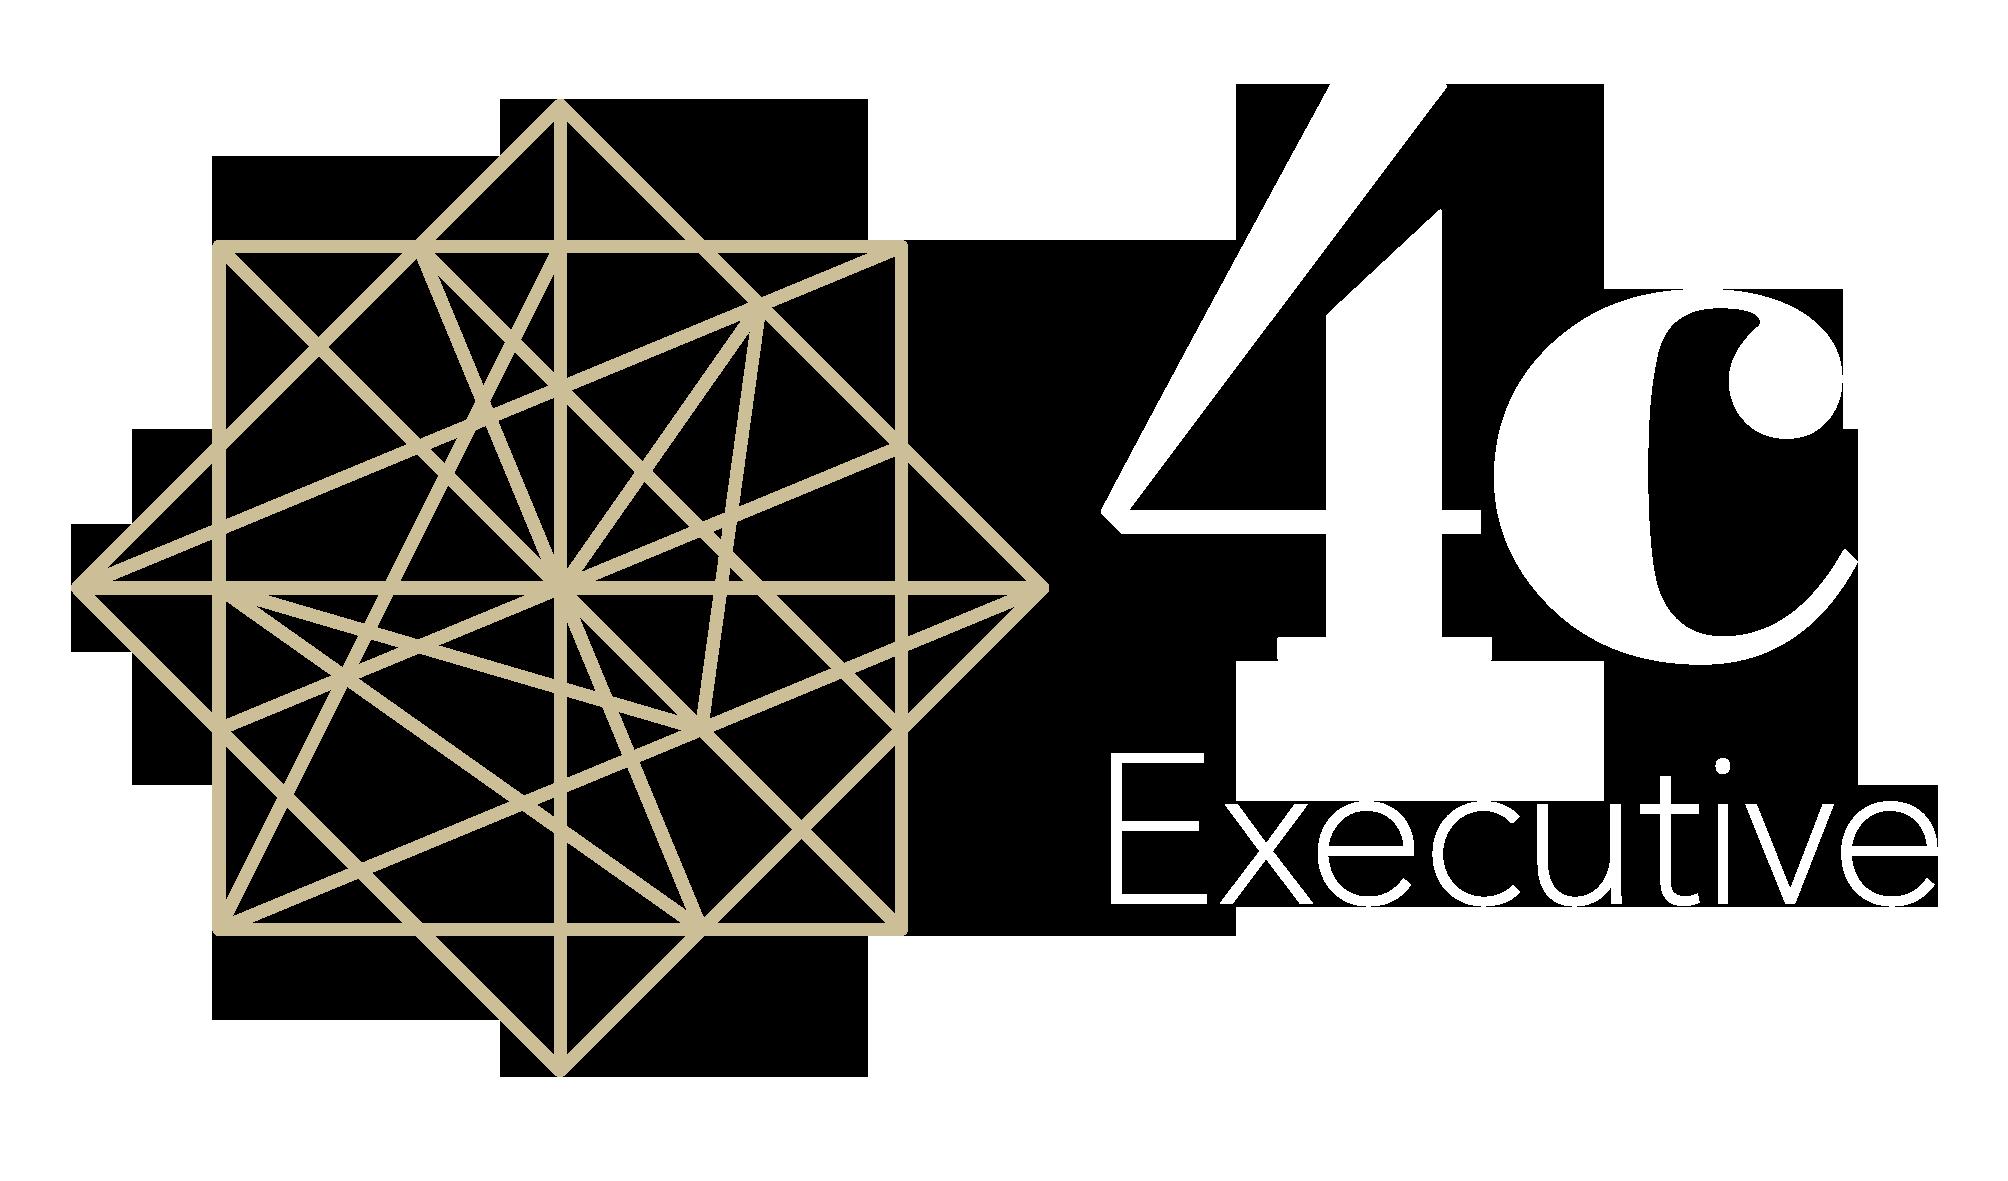 4c Executive